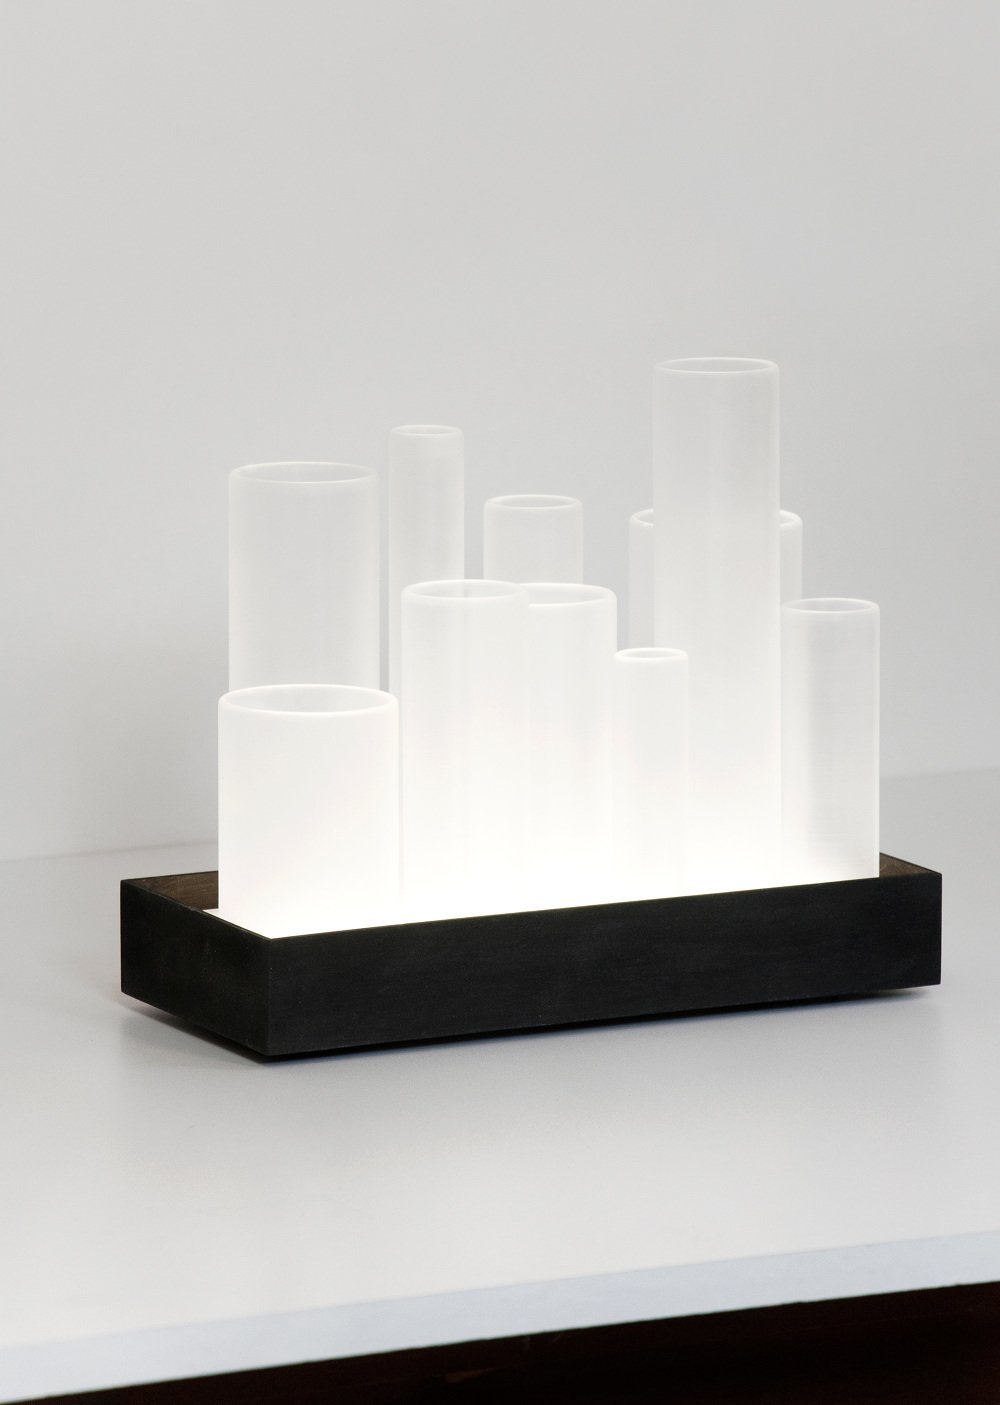 #FerréolBabin #designer #modern #set #lighting #frostlamp #abstract #furniture #lamp   60+ Modern Lighting Solutions by Dwell from Frost Lamp